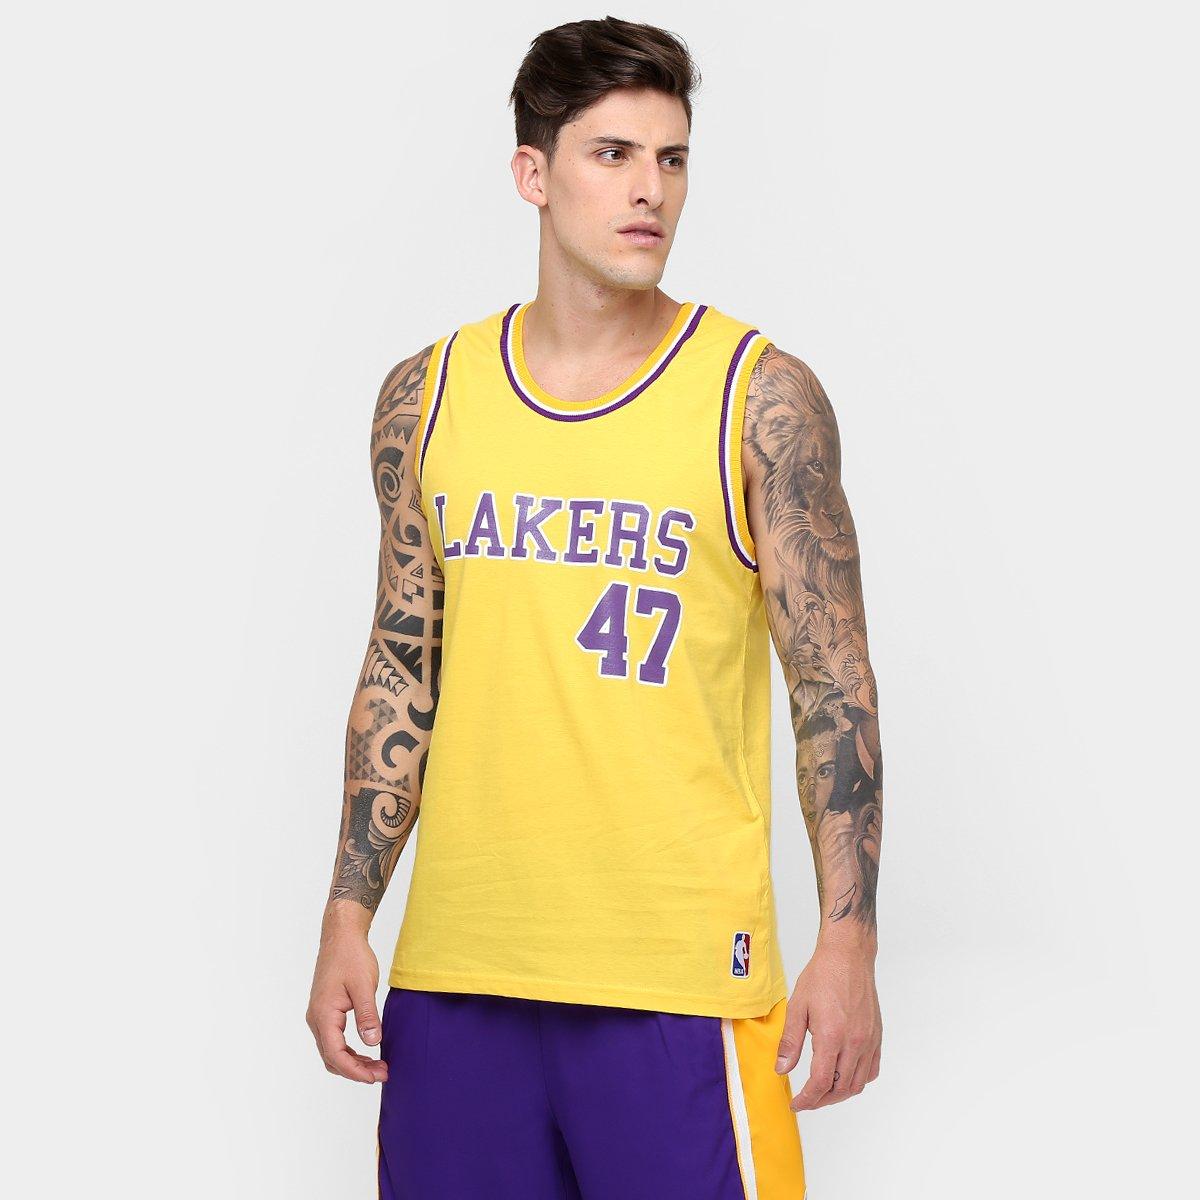 69a53473fbe63 Camiseta Regata Retrô NBA Los Angeles lakers - Compre Agora